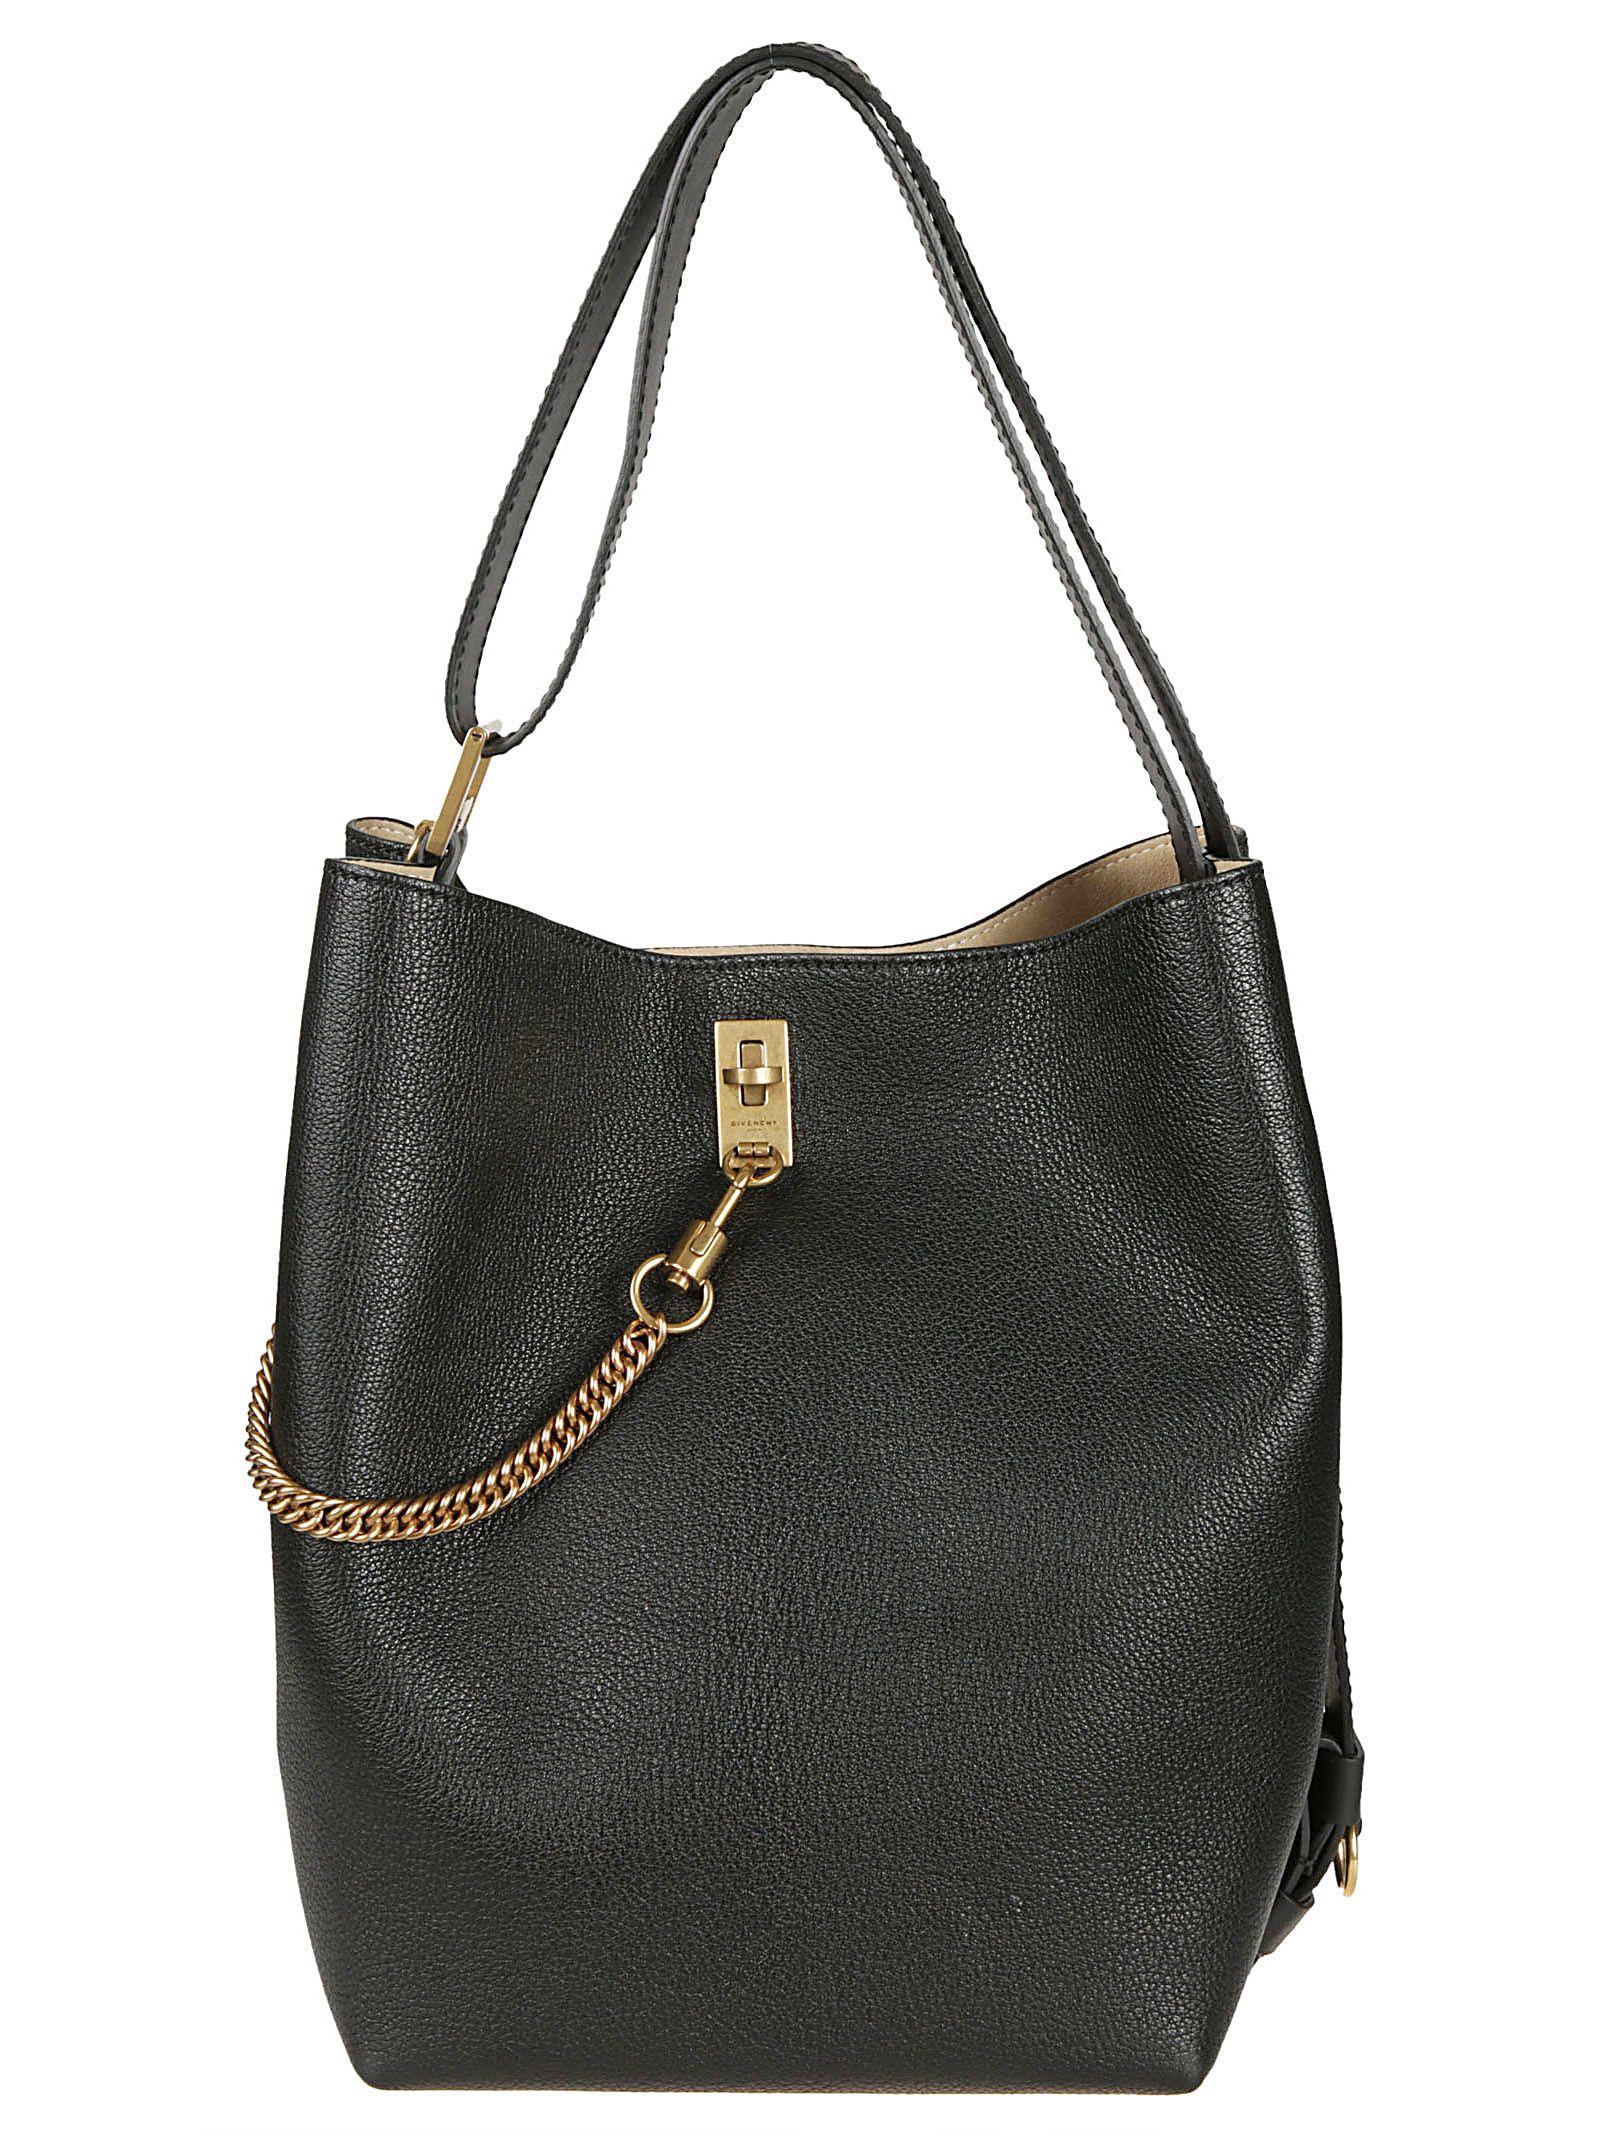 d3716d83d Givenchy Gv Shopper Bag In Black | ModeSens